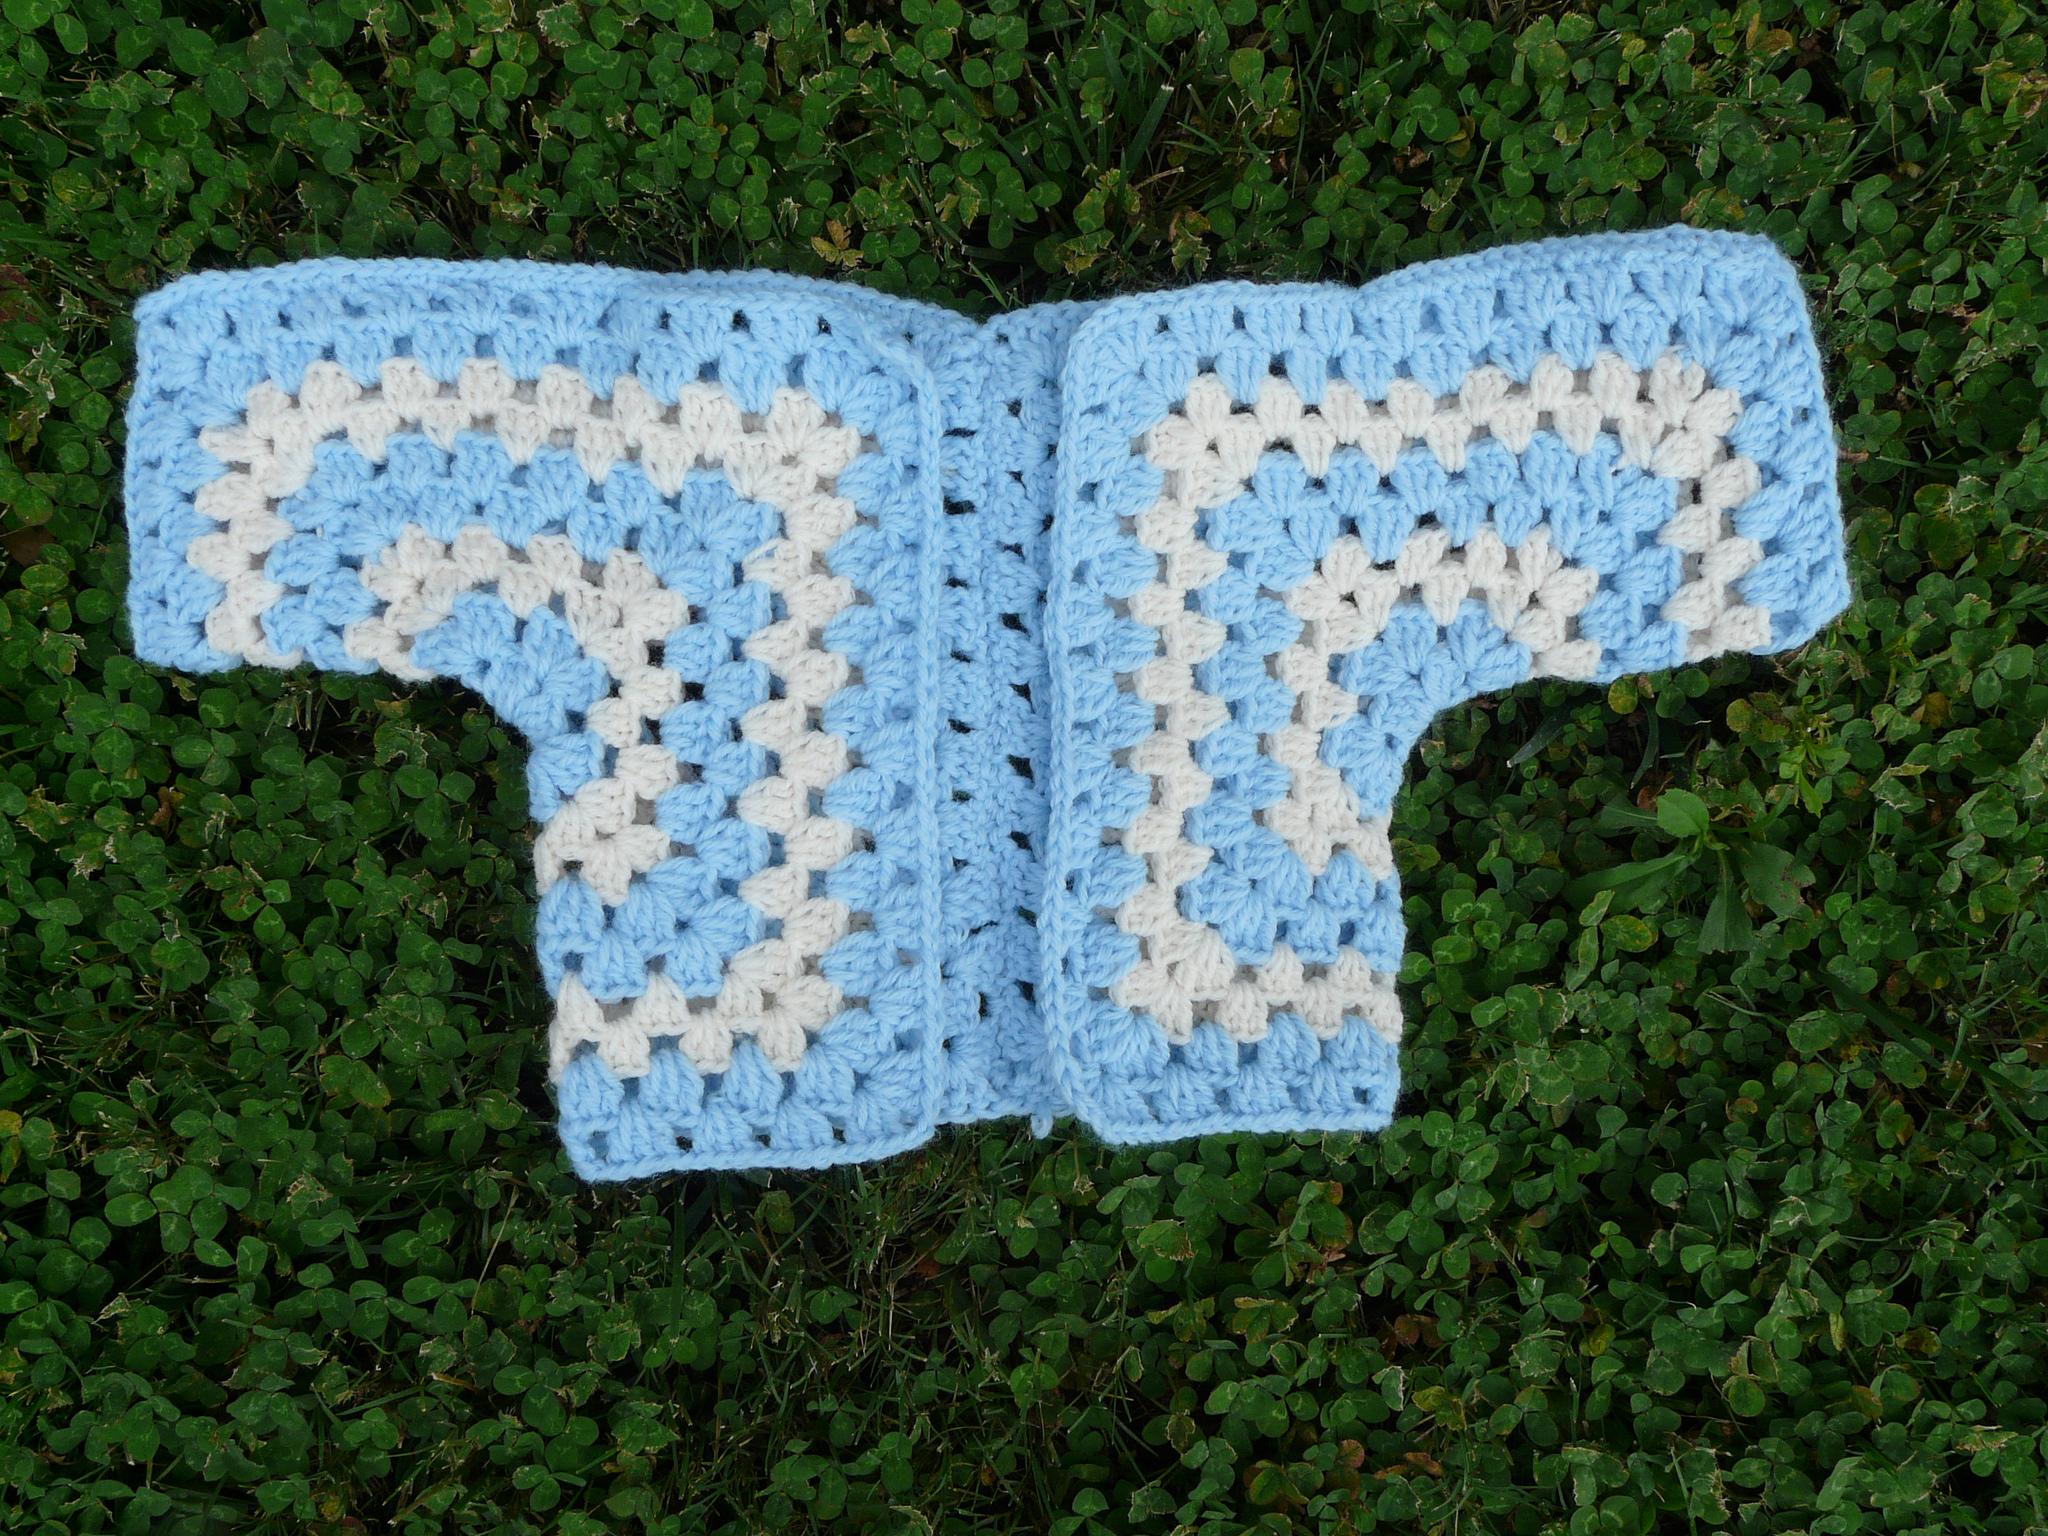 crochet baby sweater, crochetbug, crochet peeps, carolina blue